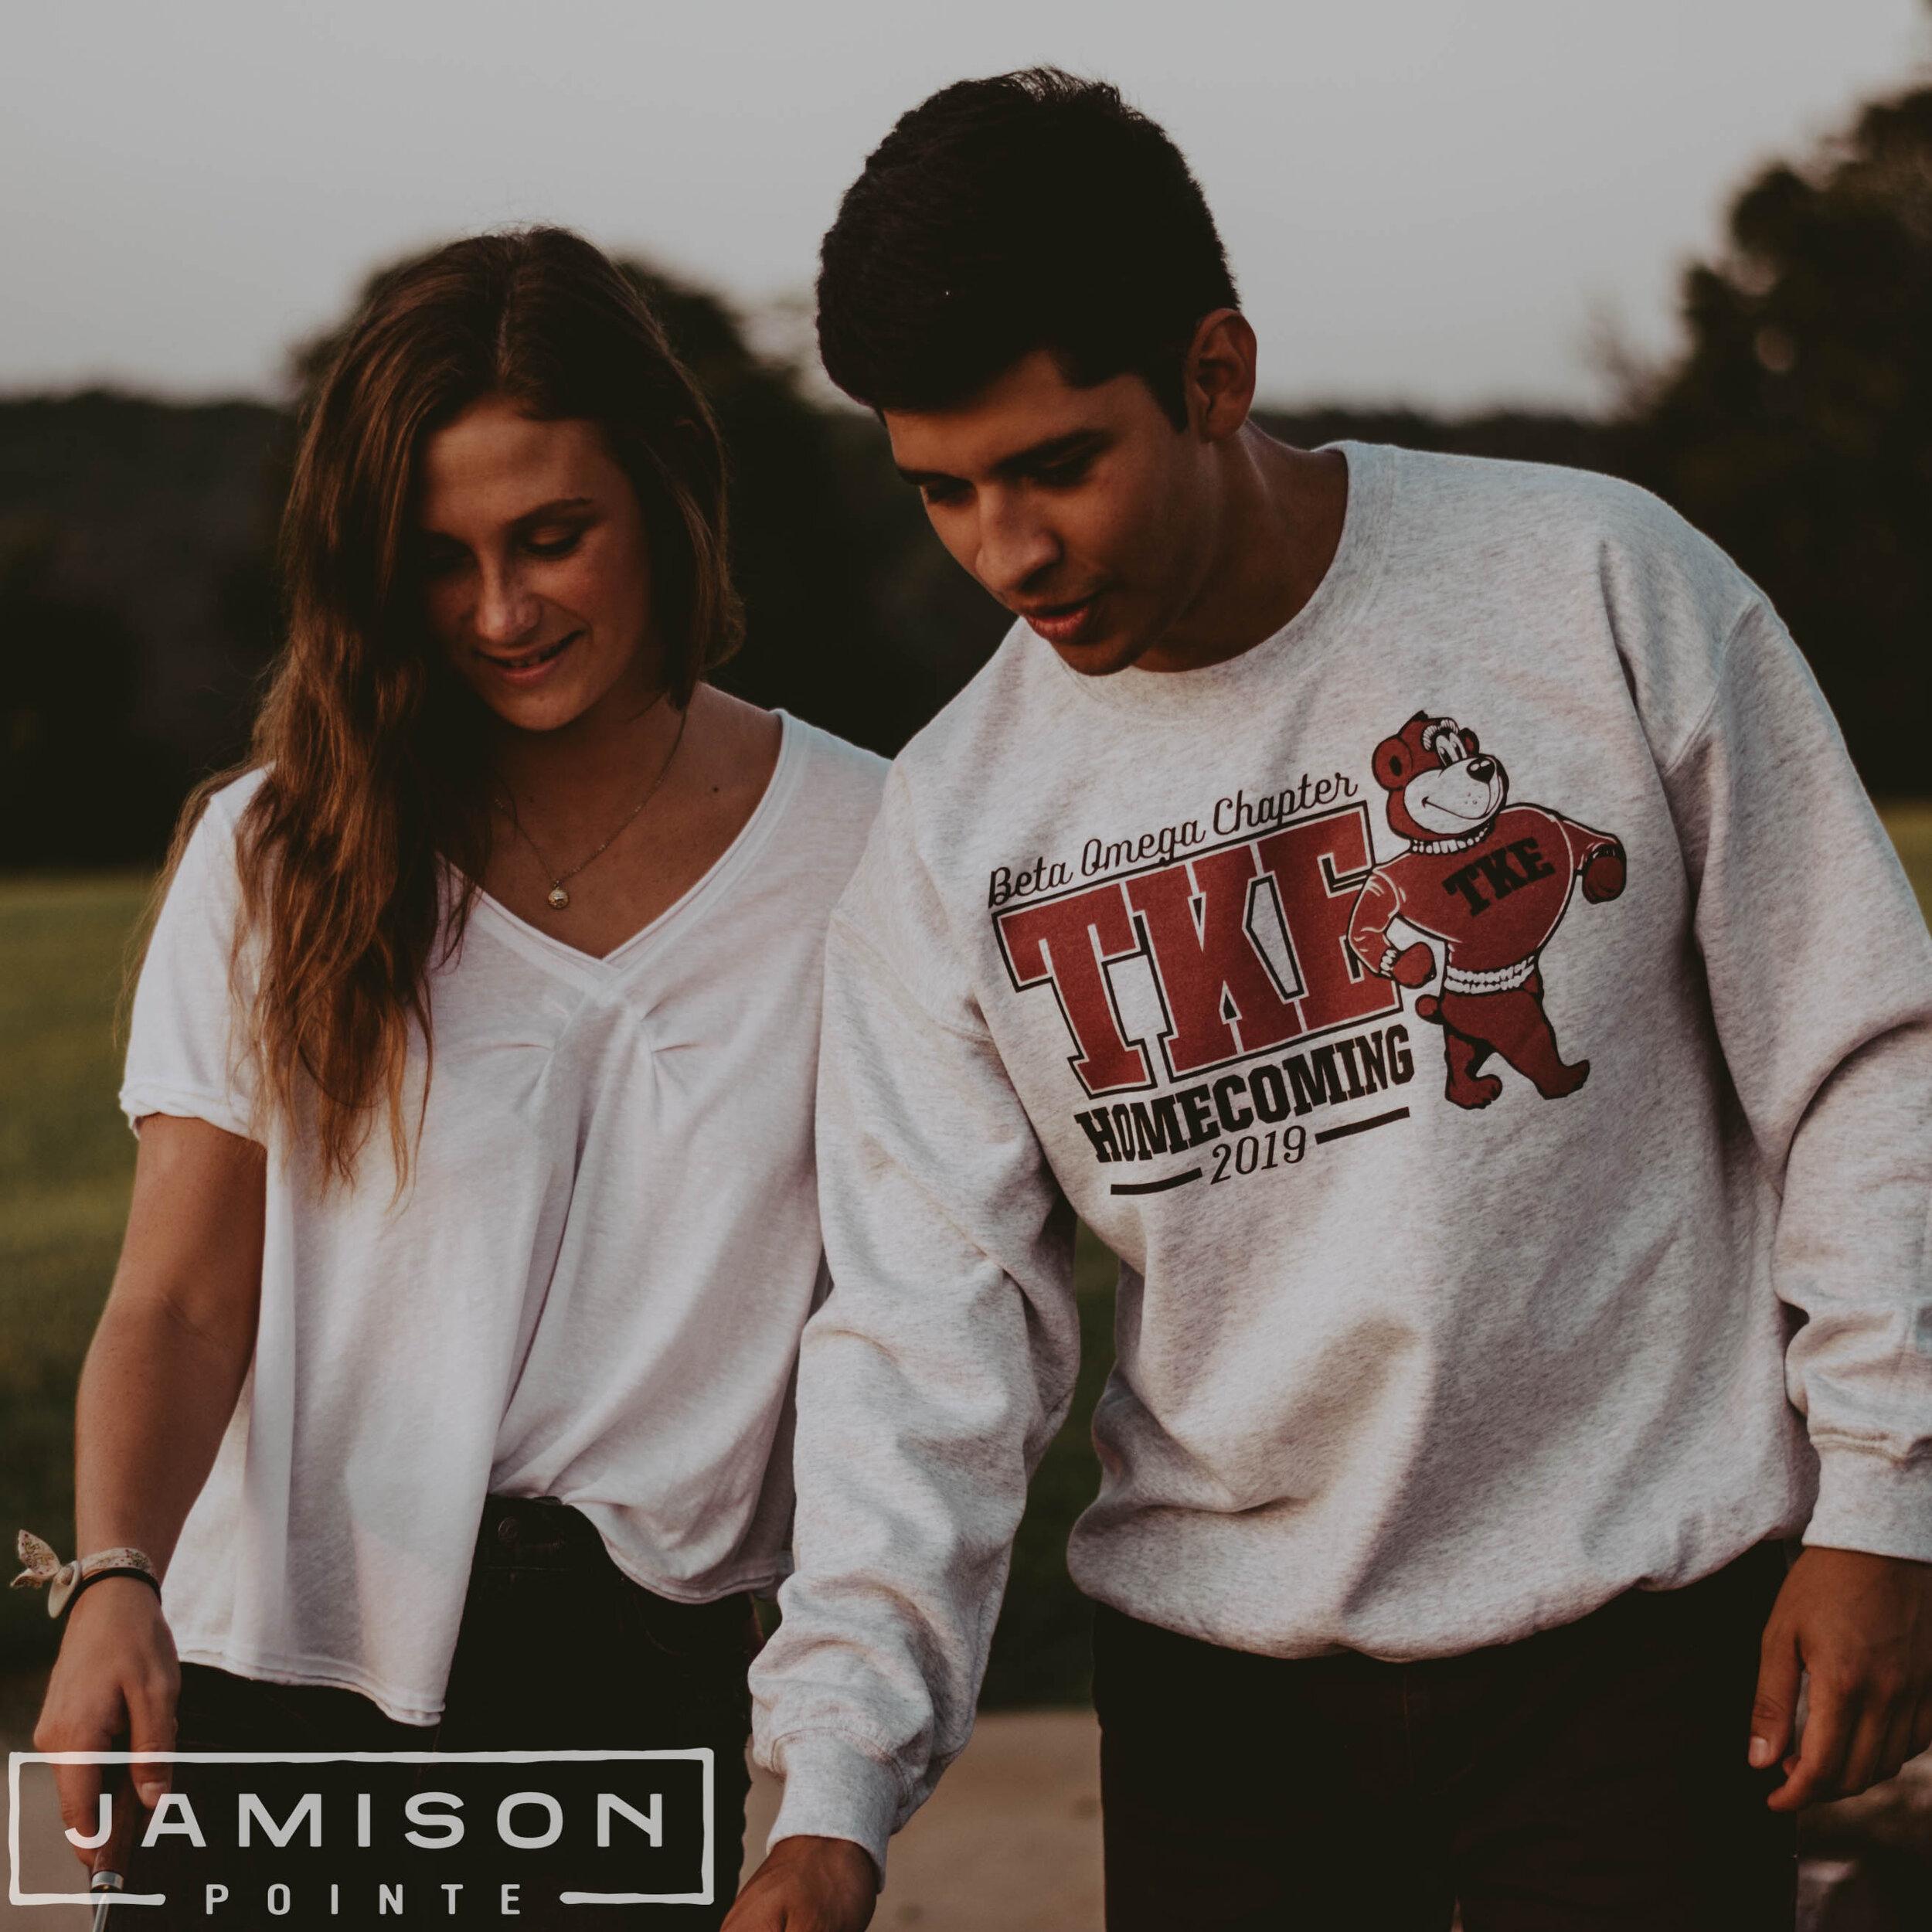 Tau Kappa Epsilon Homecoming Sweatshirt